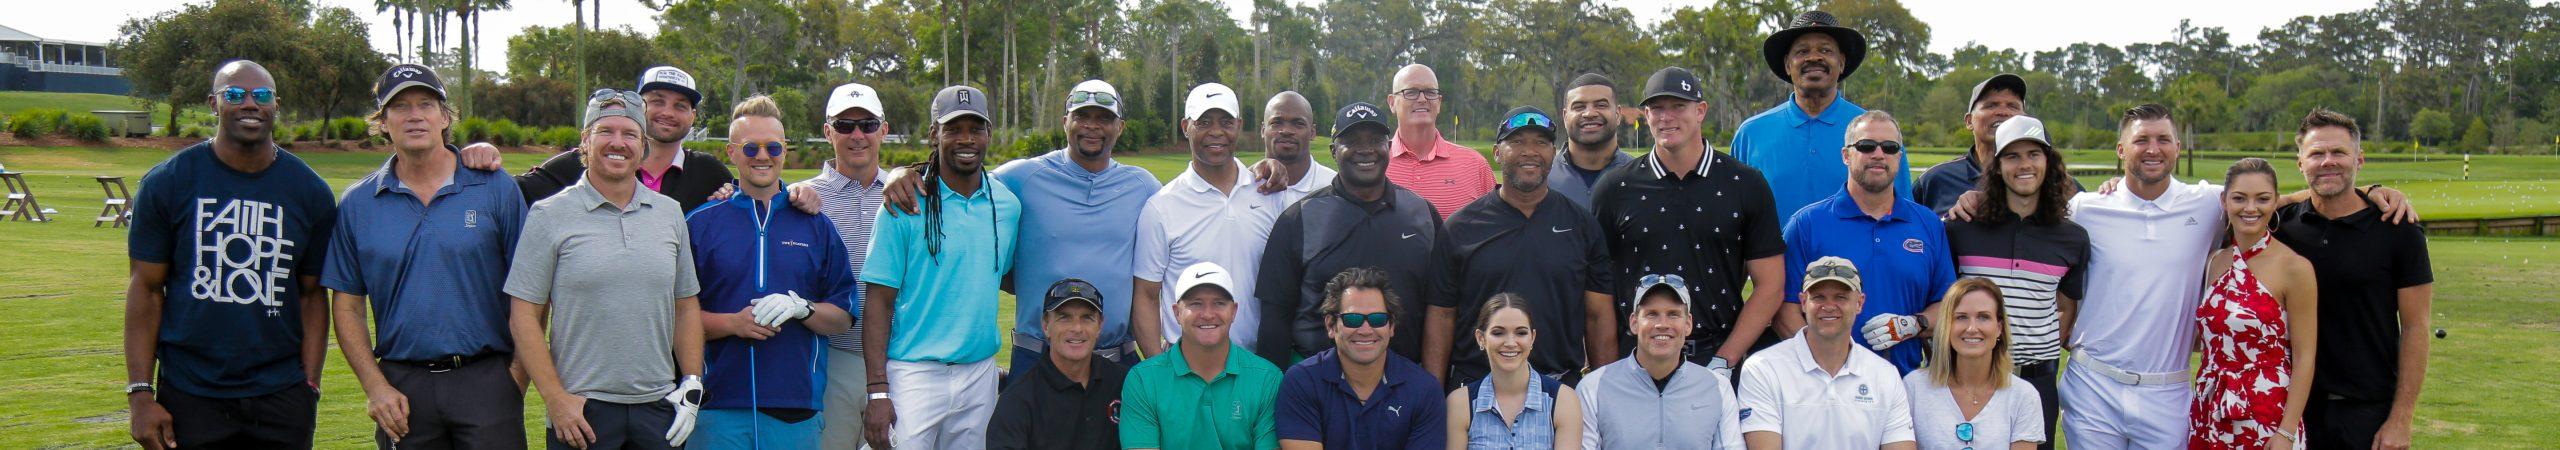 Tim Tebow Foundation Celebrity Golf Classic